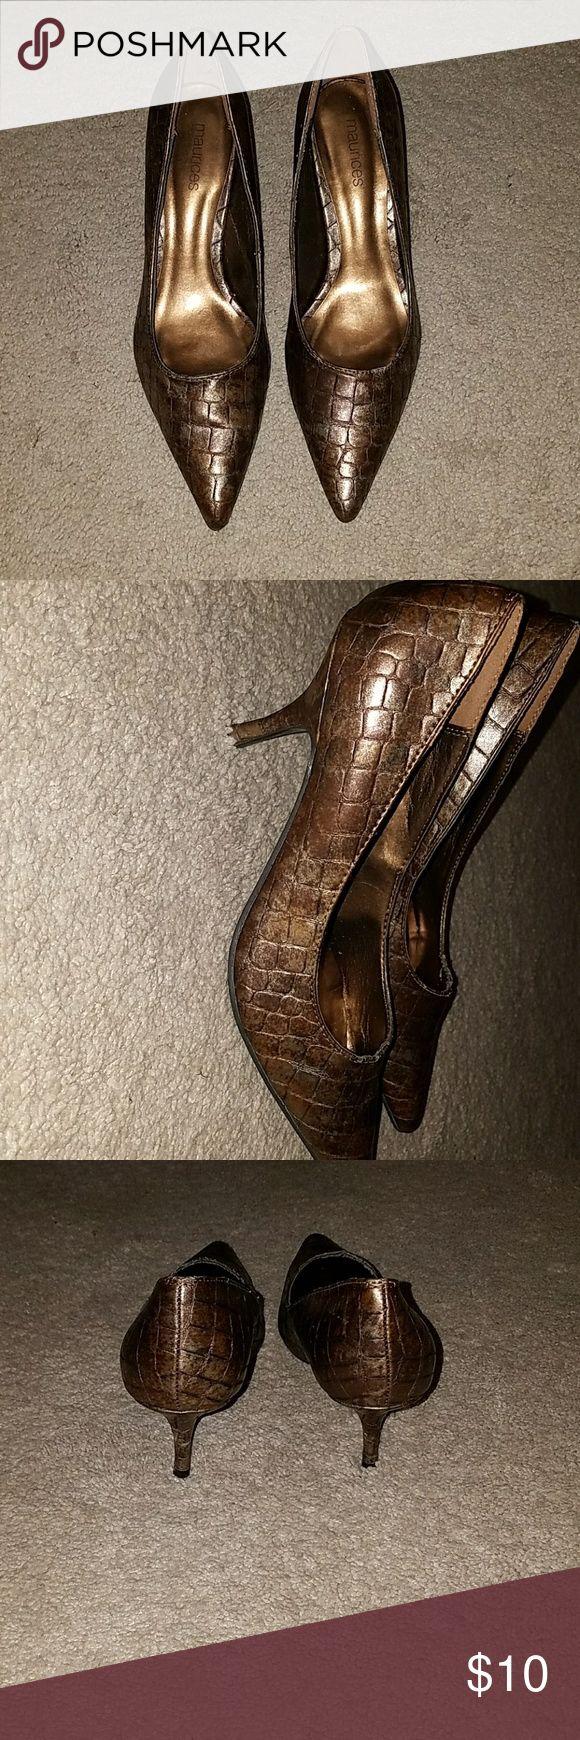 Women's Maurice Brand HIGH HEELS Copper/metallic textured super cute high heels. Worn once Maurices Shoes Heels